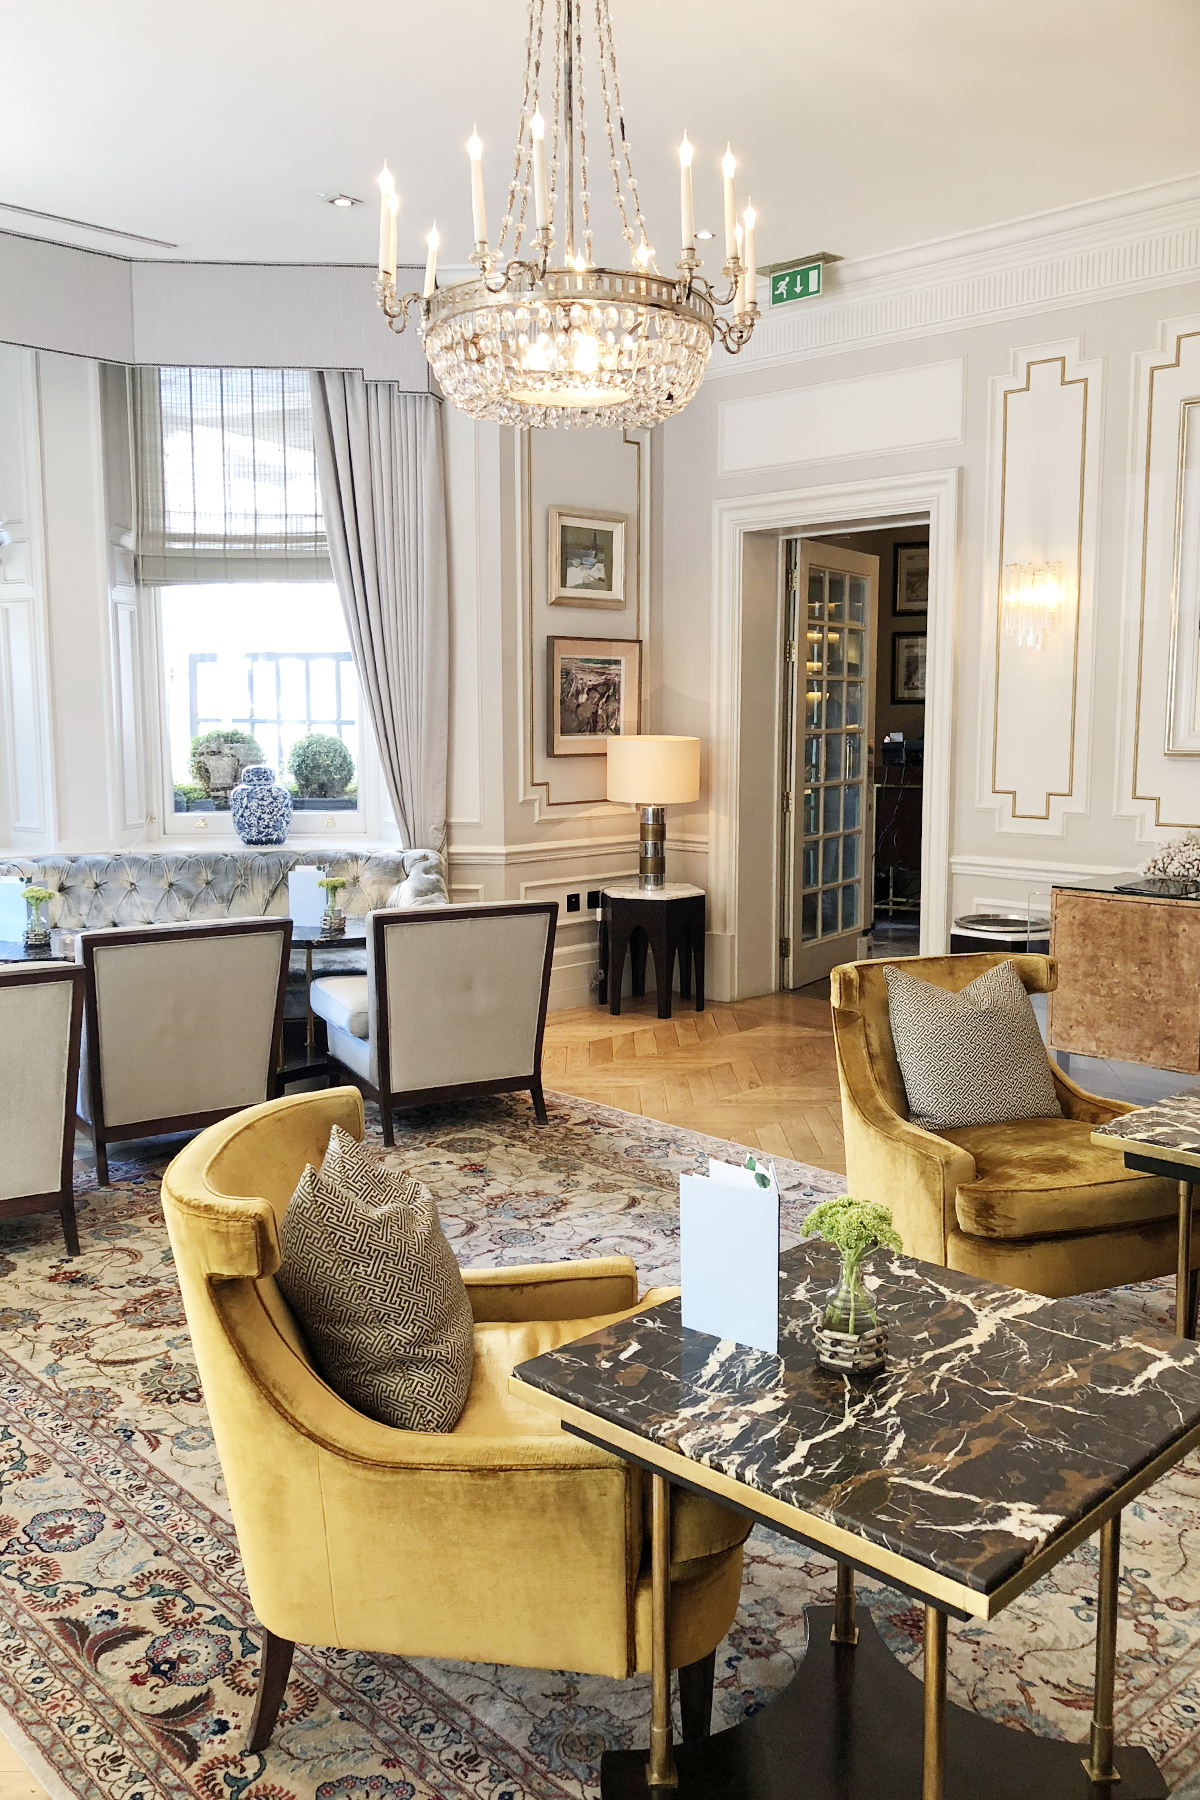 The kensington hotel london 5